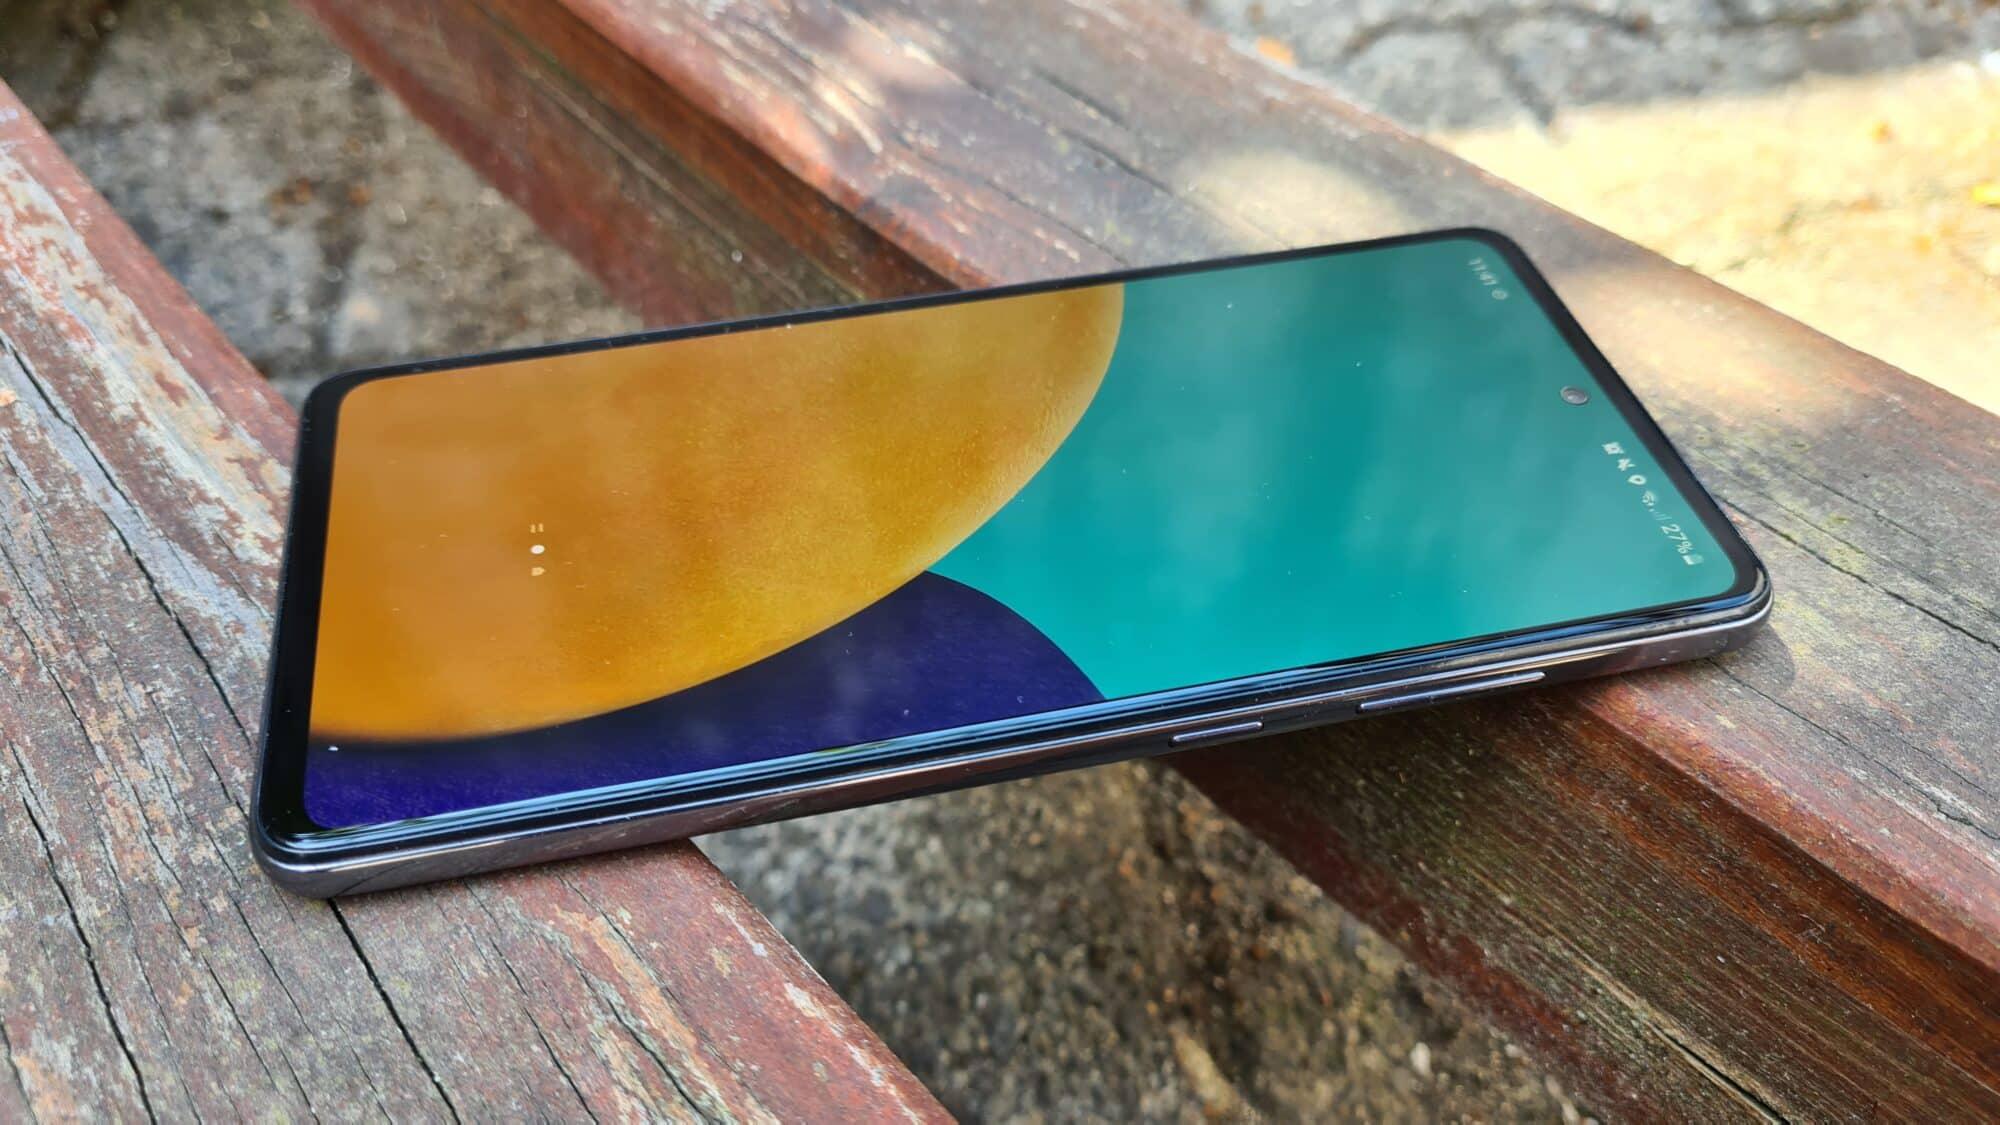 Galaxy A52 5G - Introduction